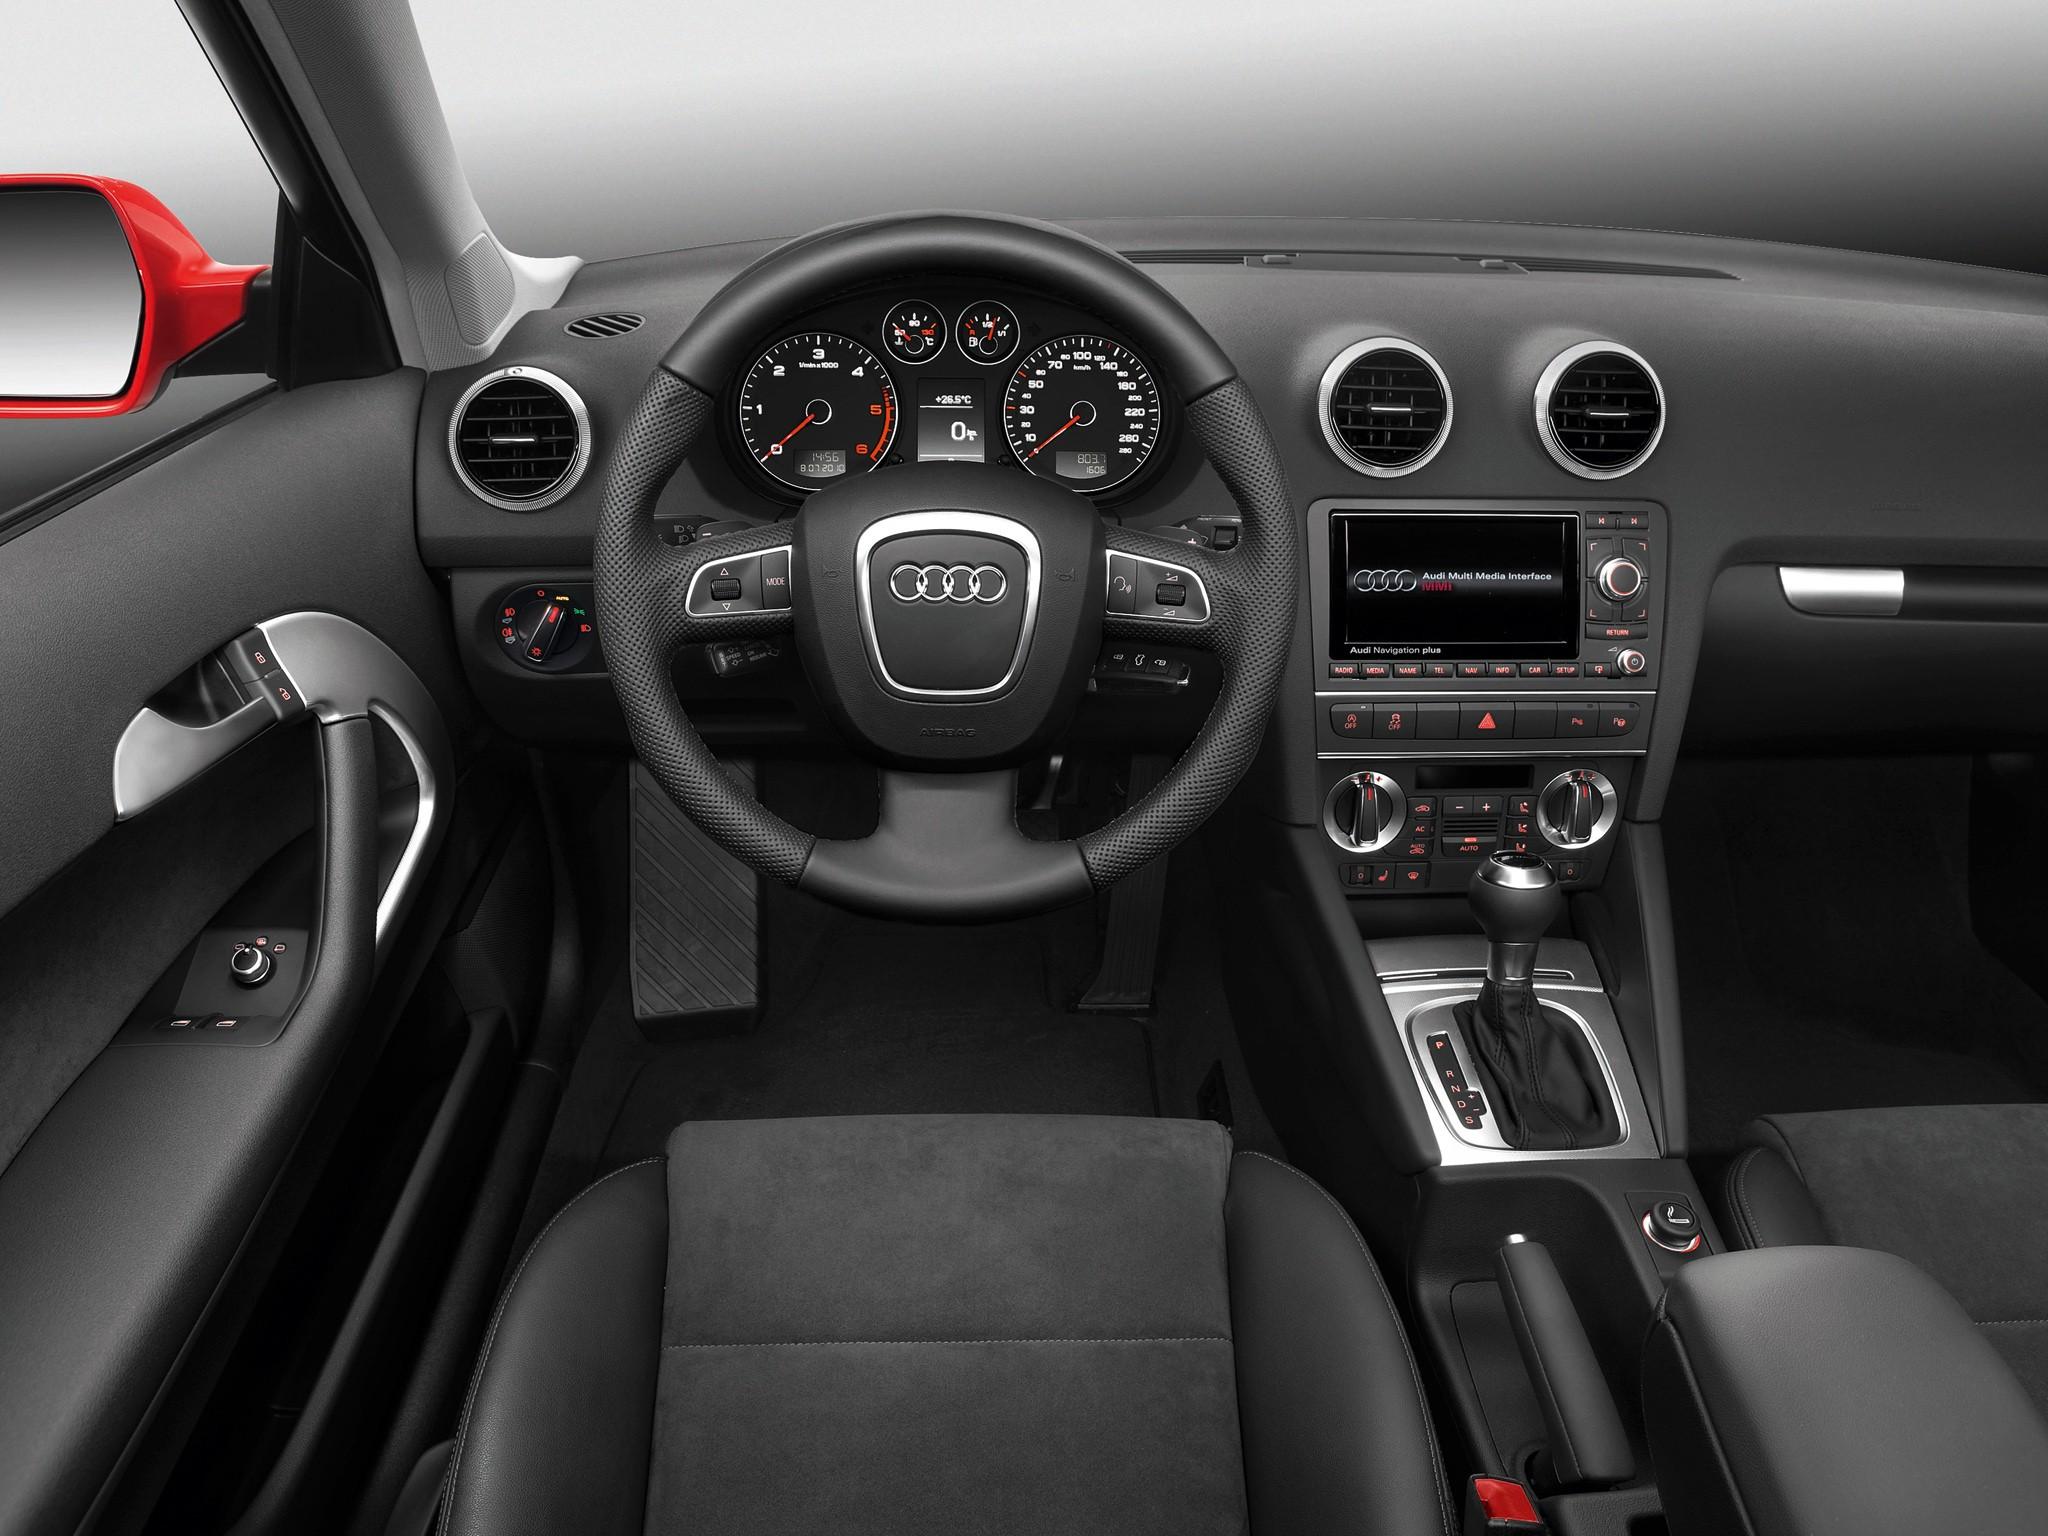 Auto Interior Upholstery